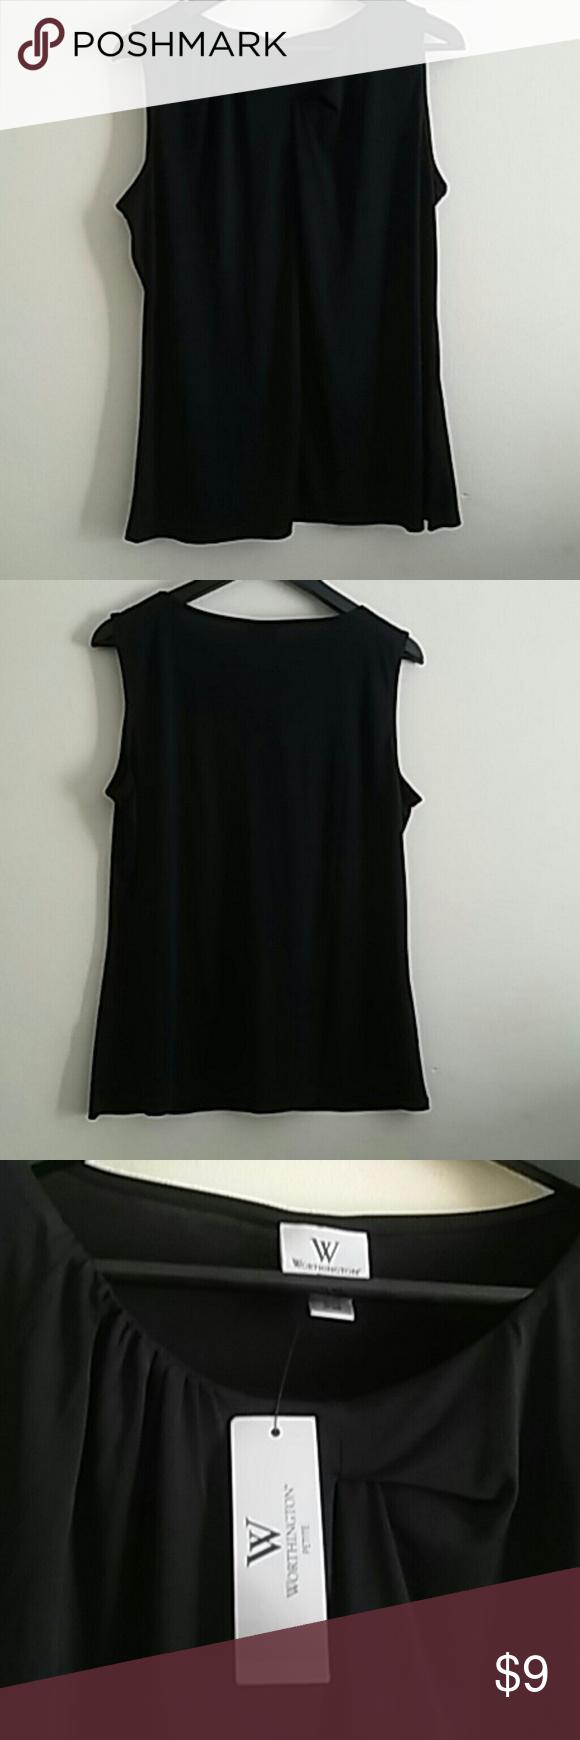 Blouse Black blouse. Worthington Tops Blouses